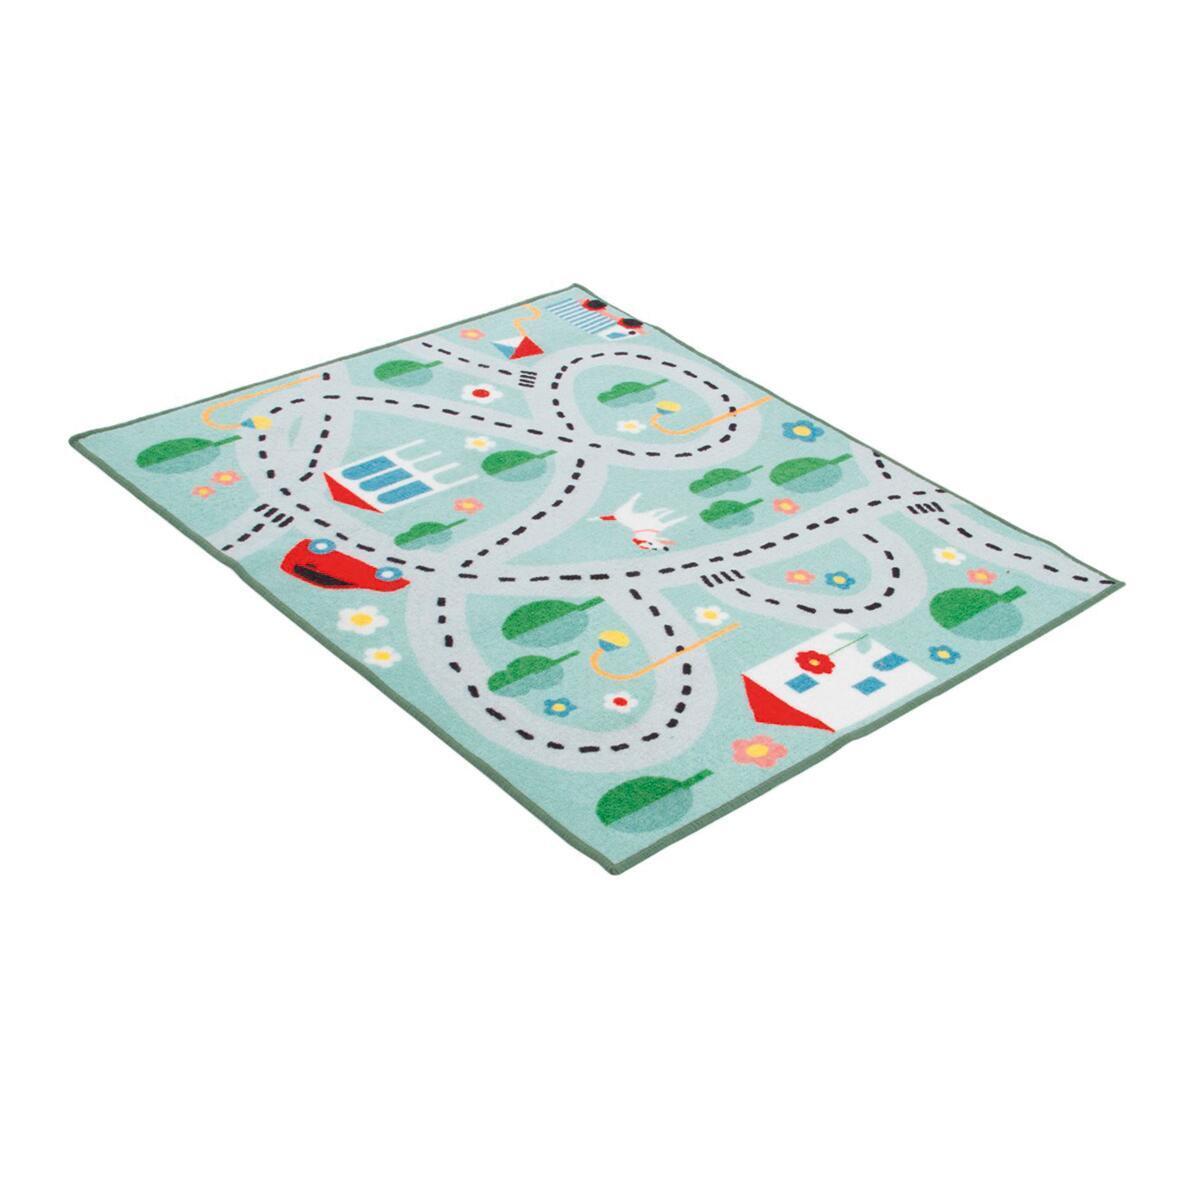 Tappeto Playrug city , colori assortiti, 100x120 - 5